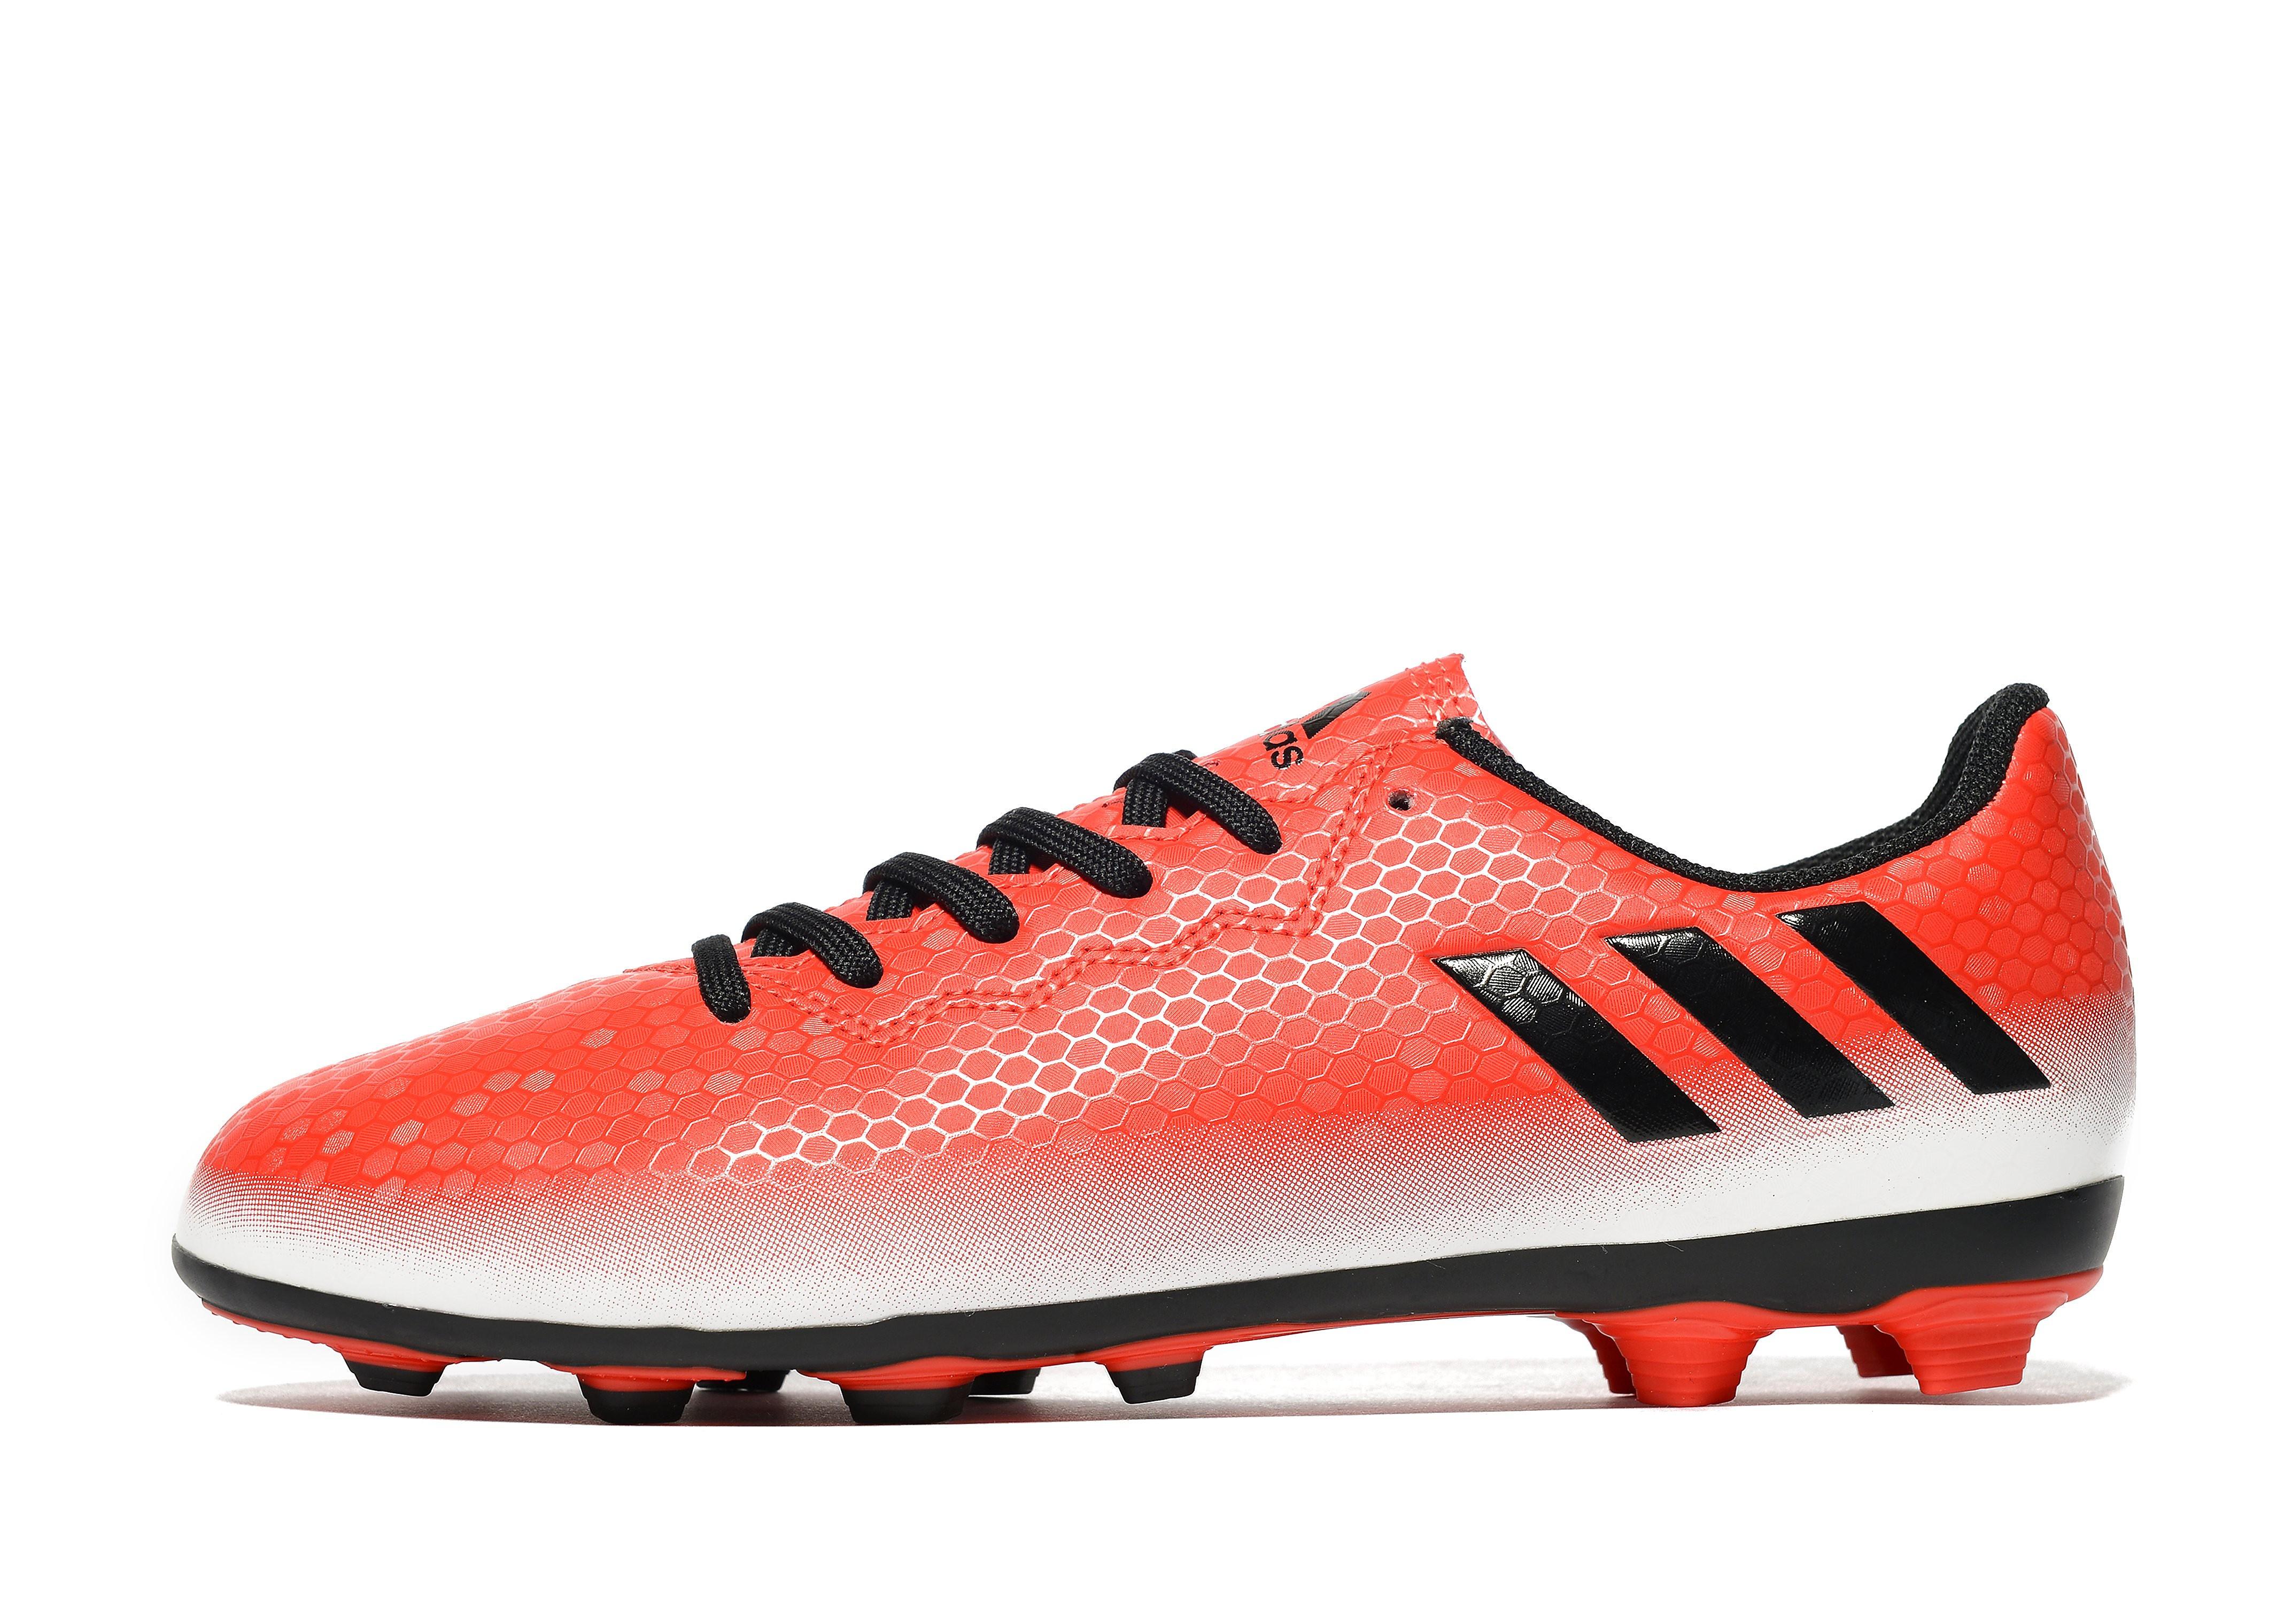 adidas Red Limit Messi 16.4 FG Junior